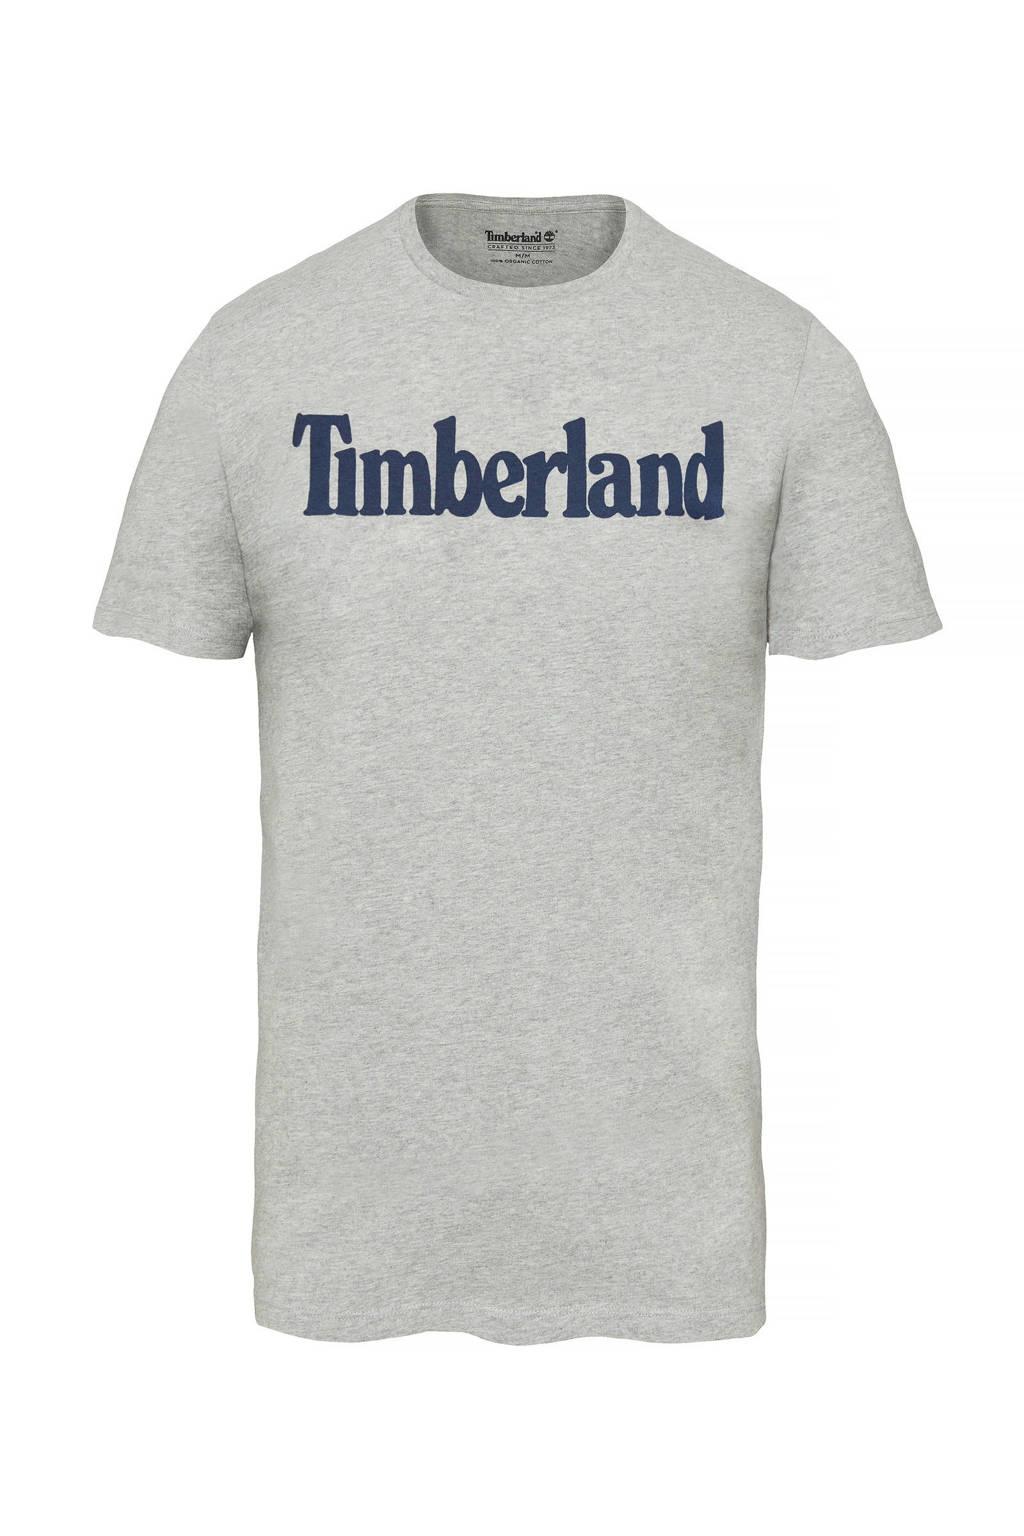 Timberland T-shirt met print grijs, Grijs